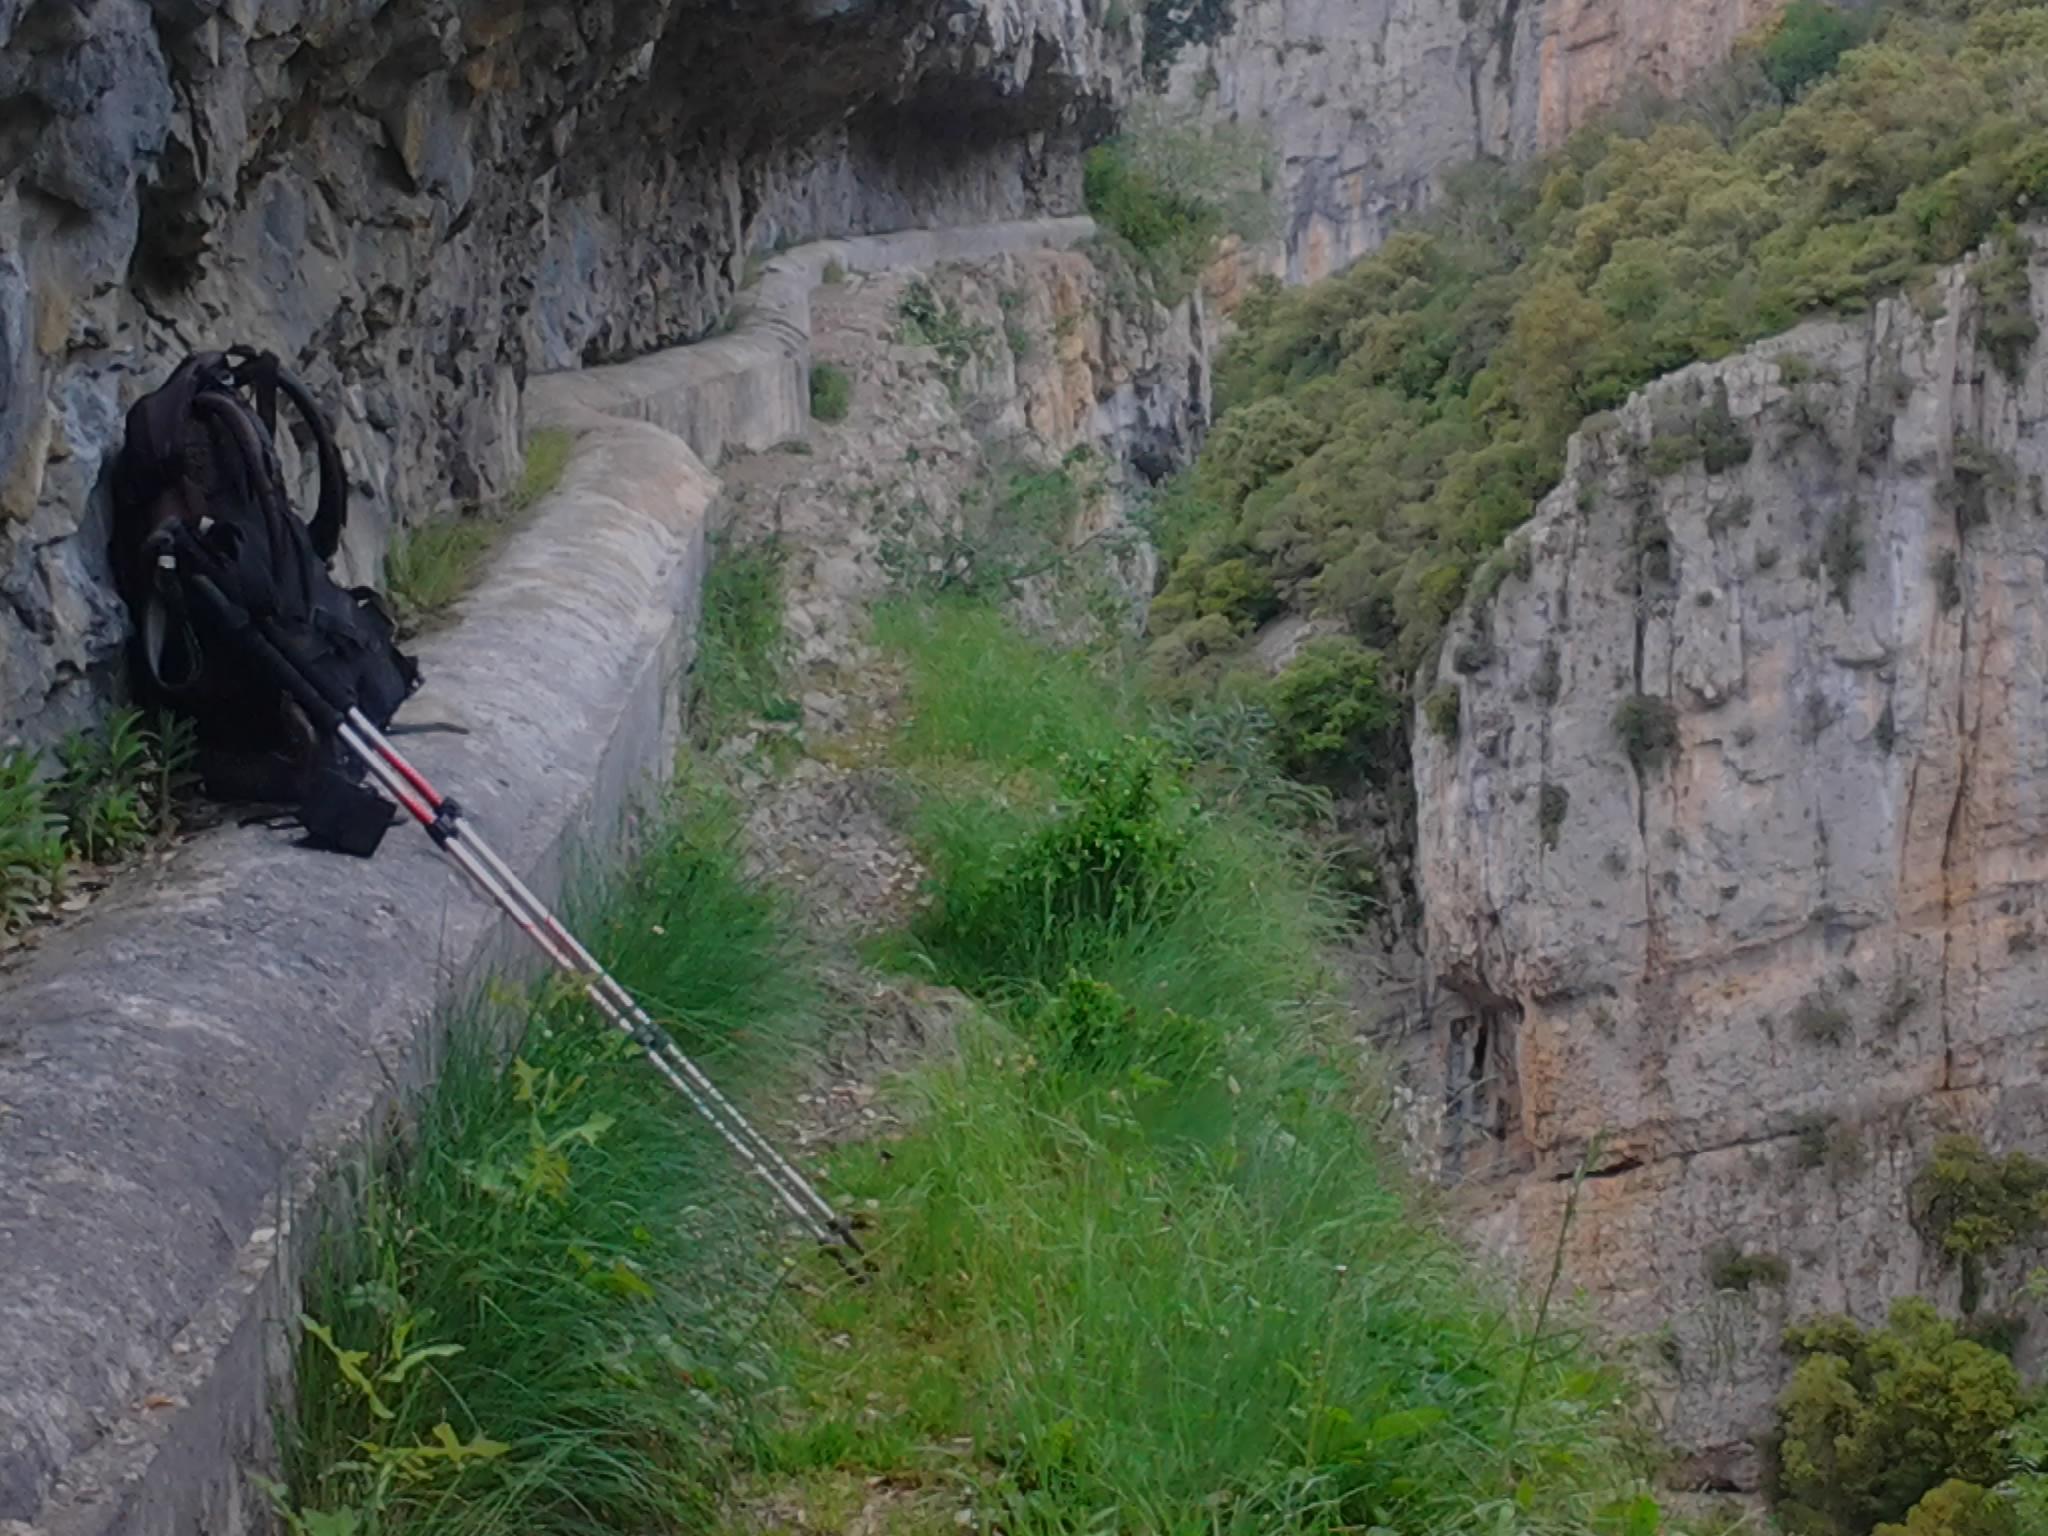 24-5-2014- Sabado Lumbier-Arangoiti (1346m) -Usun